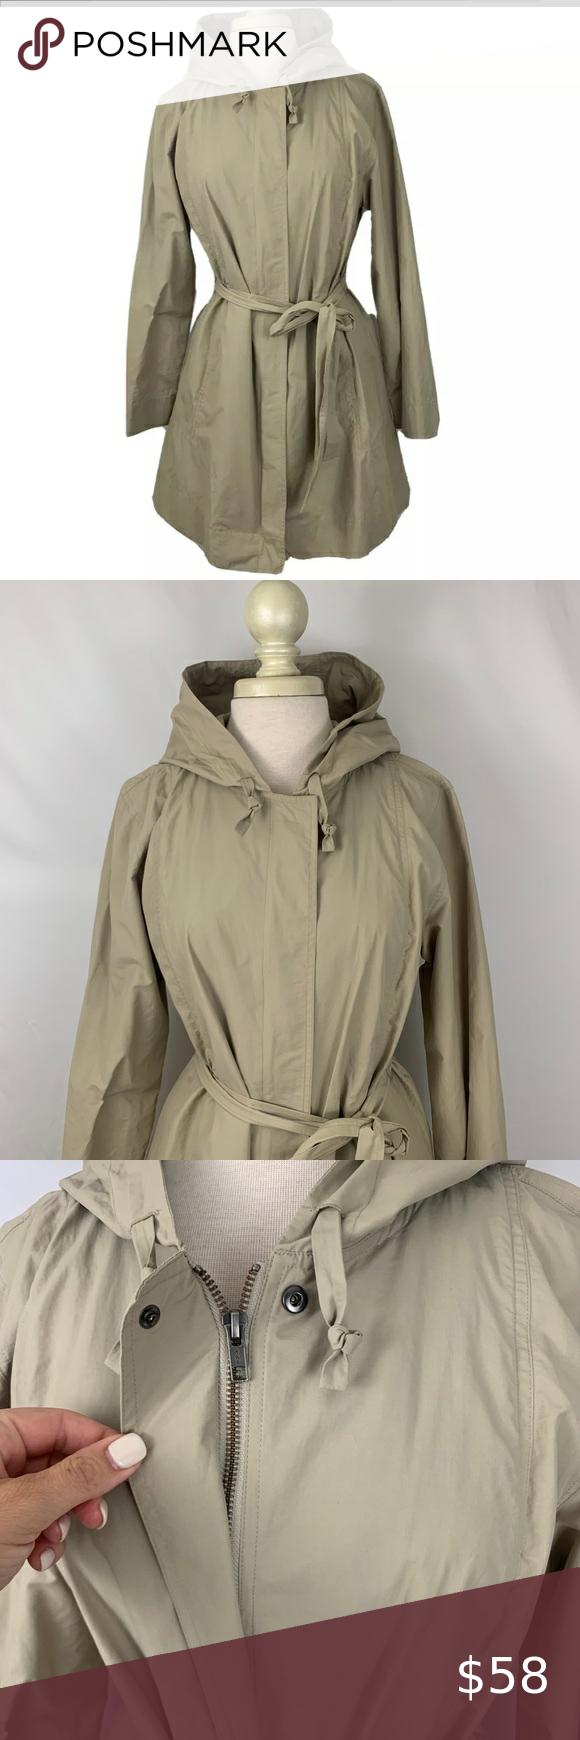 Eileen Fisher Belted Khaki Tan Trench Coat Jacket Trench Coat Jackets Tan Trench Coat Trench Coat [ 1740 x 580 Pixel ]